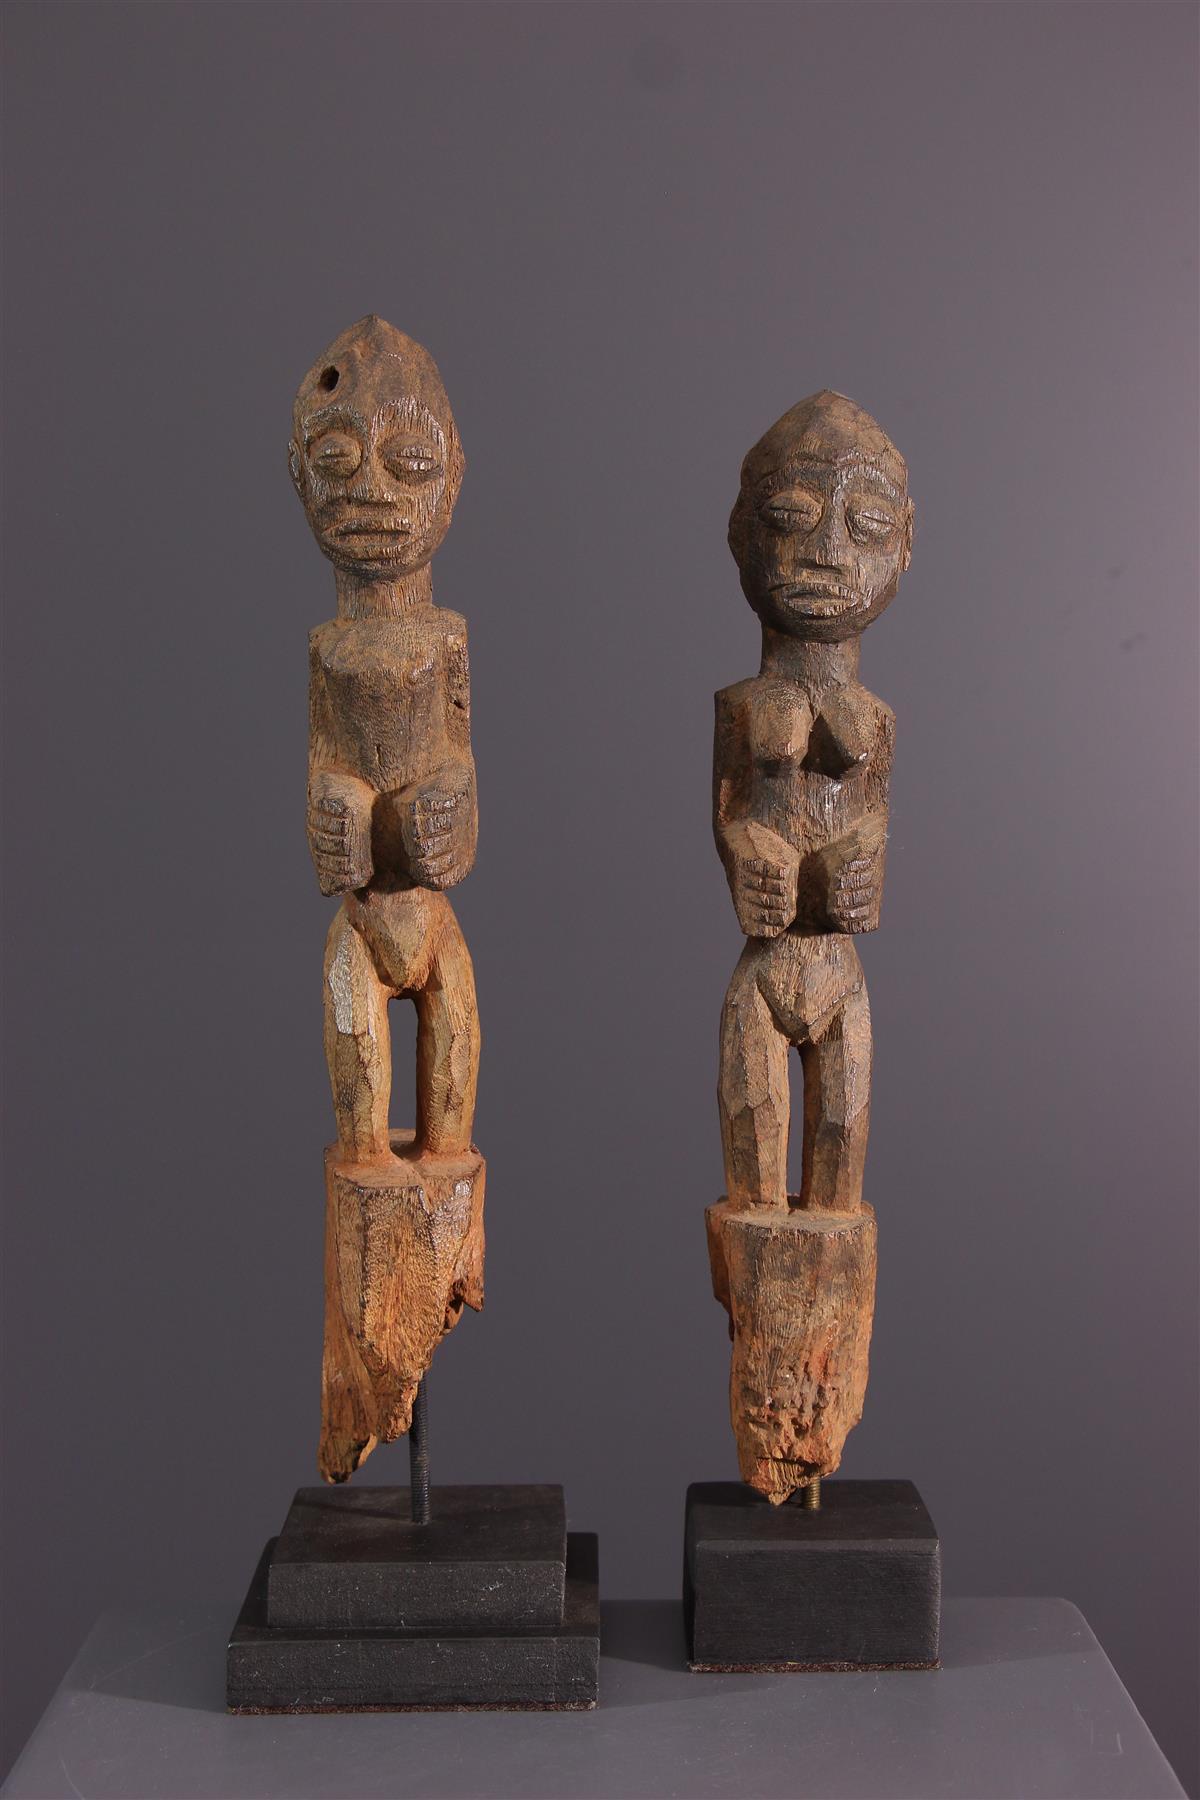 Vaudou statue - Tribal art